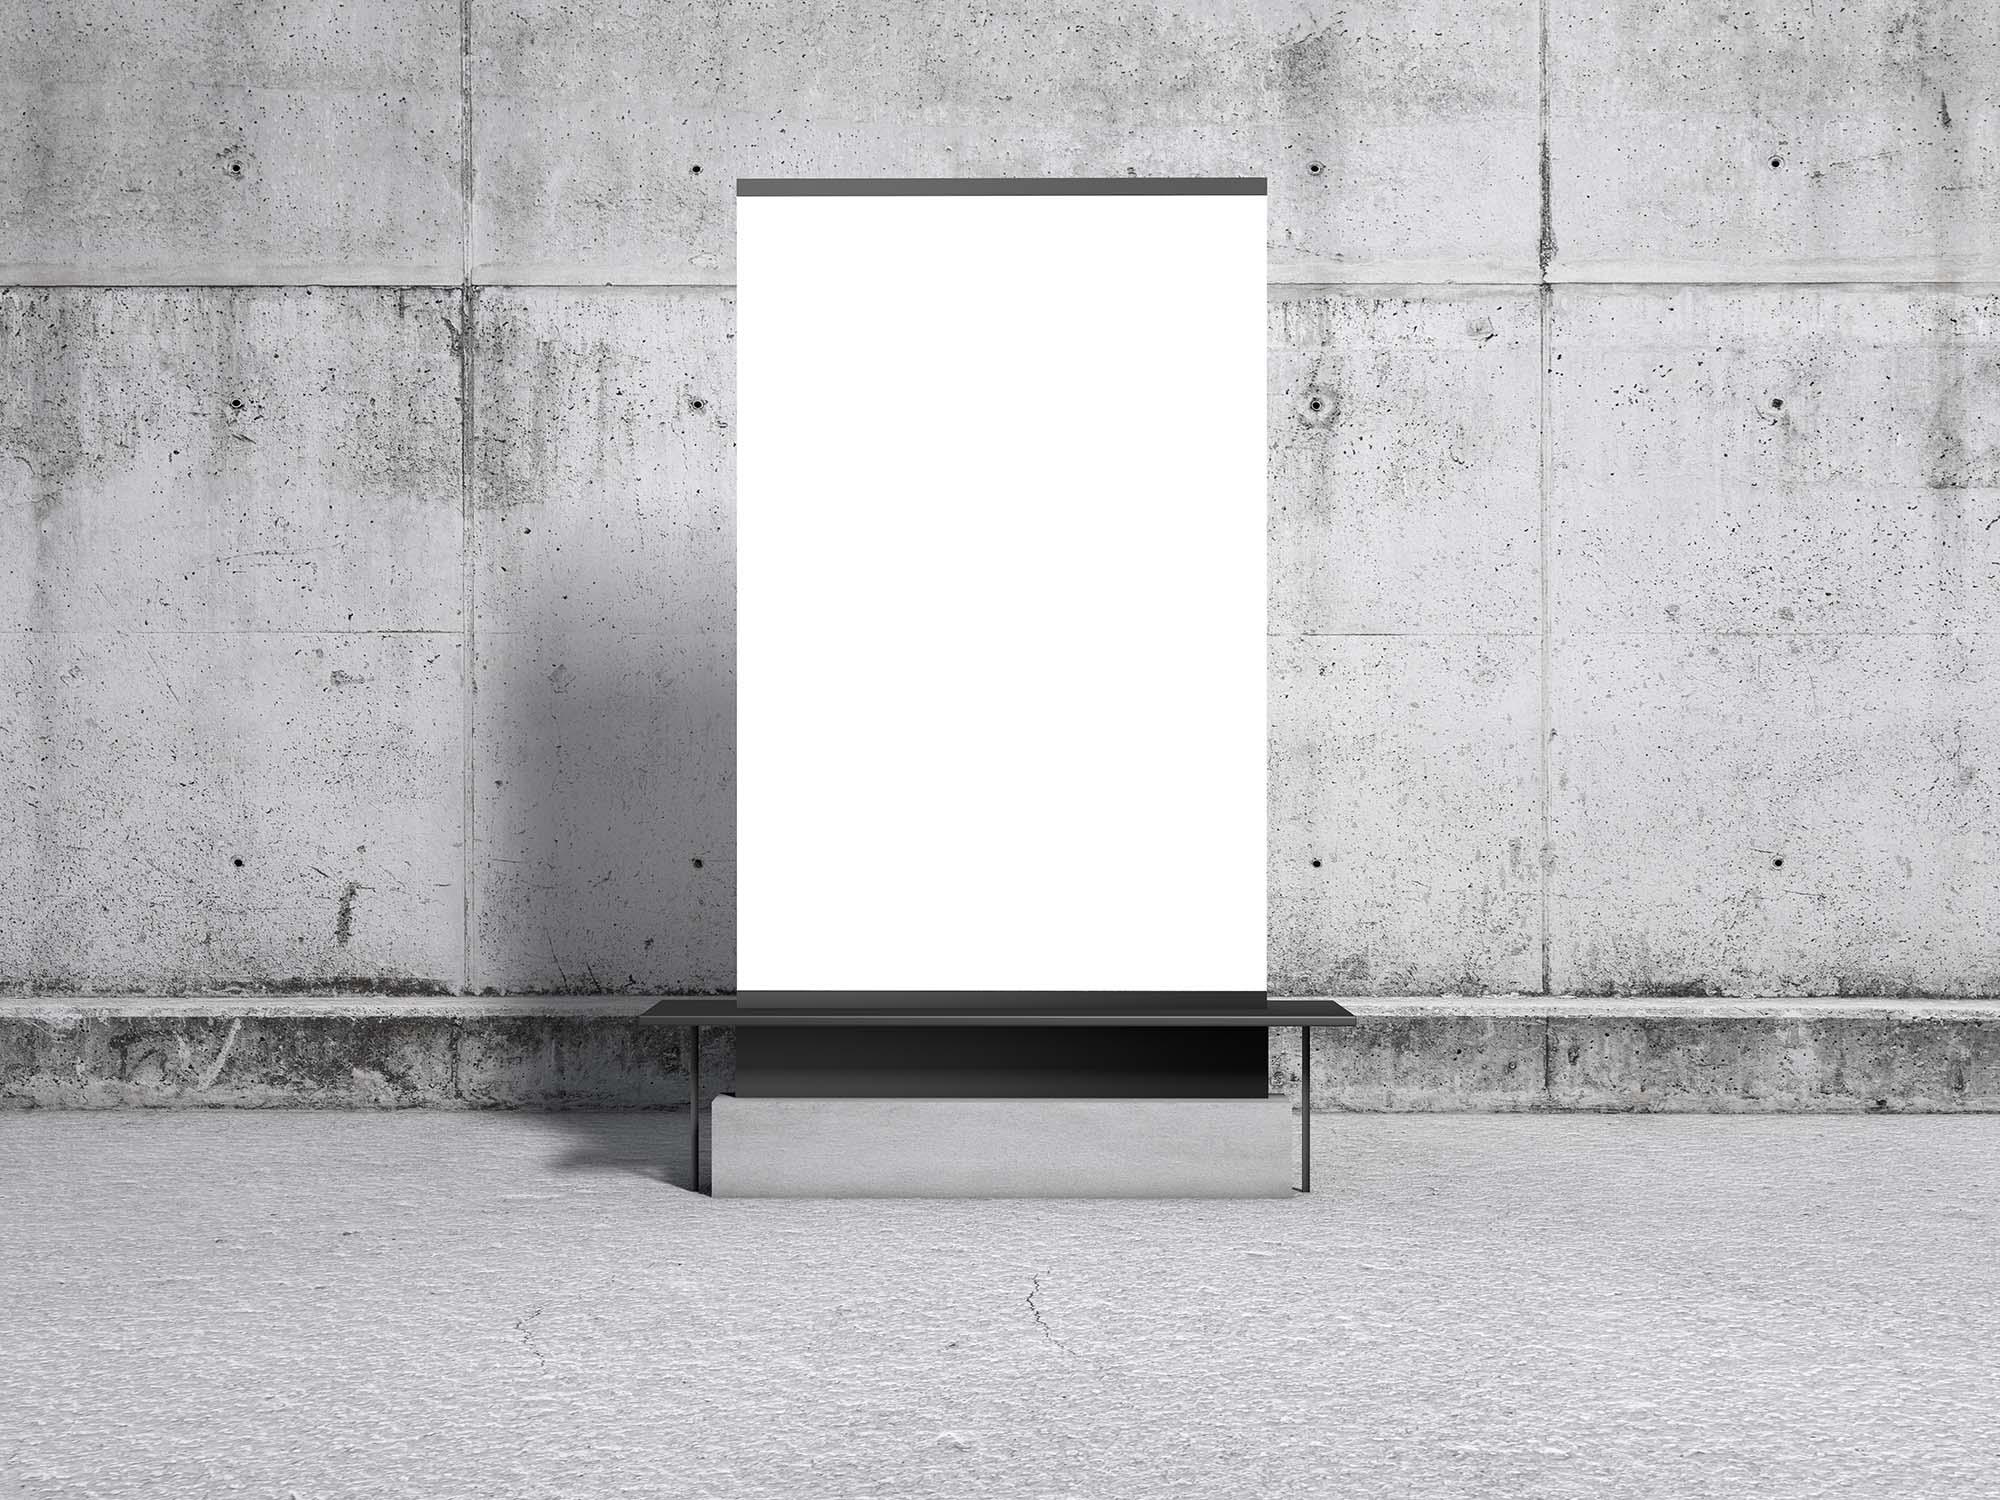 Concrete Environment Display Poster Mockup 2